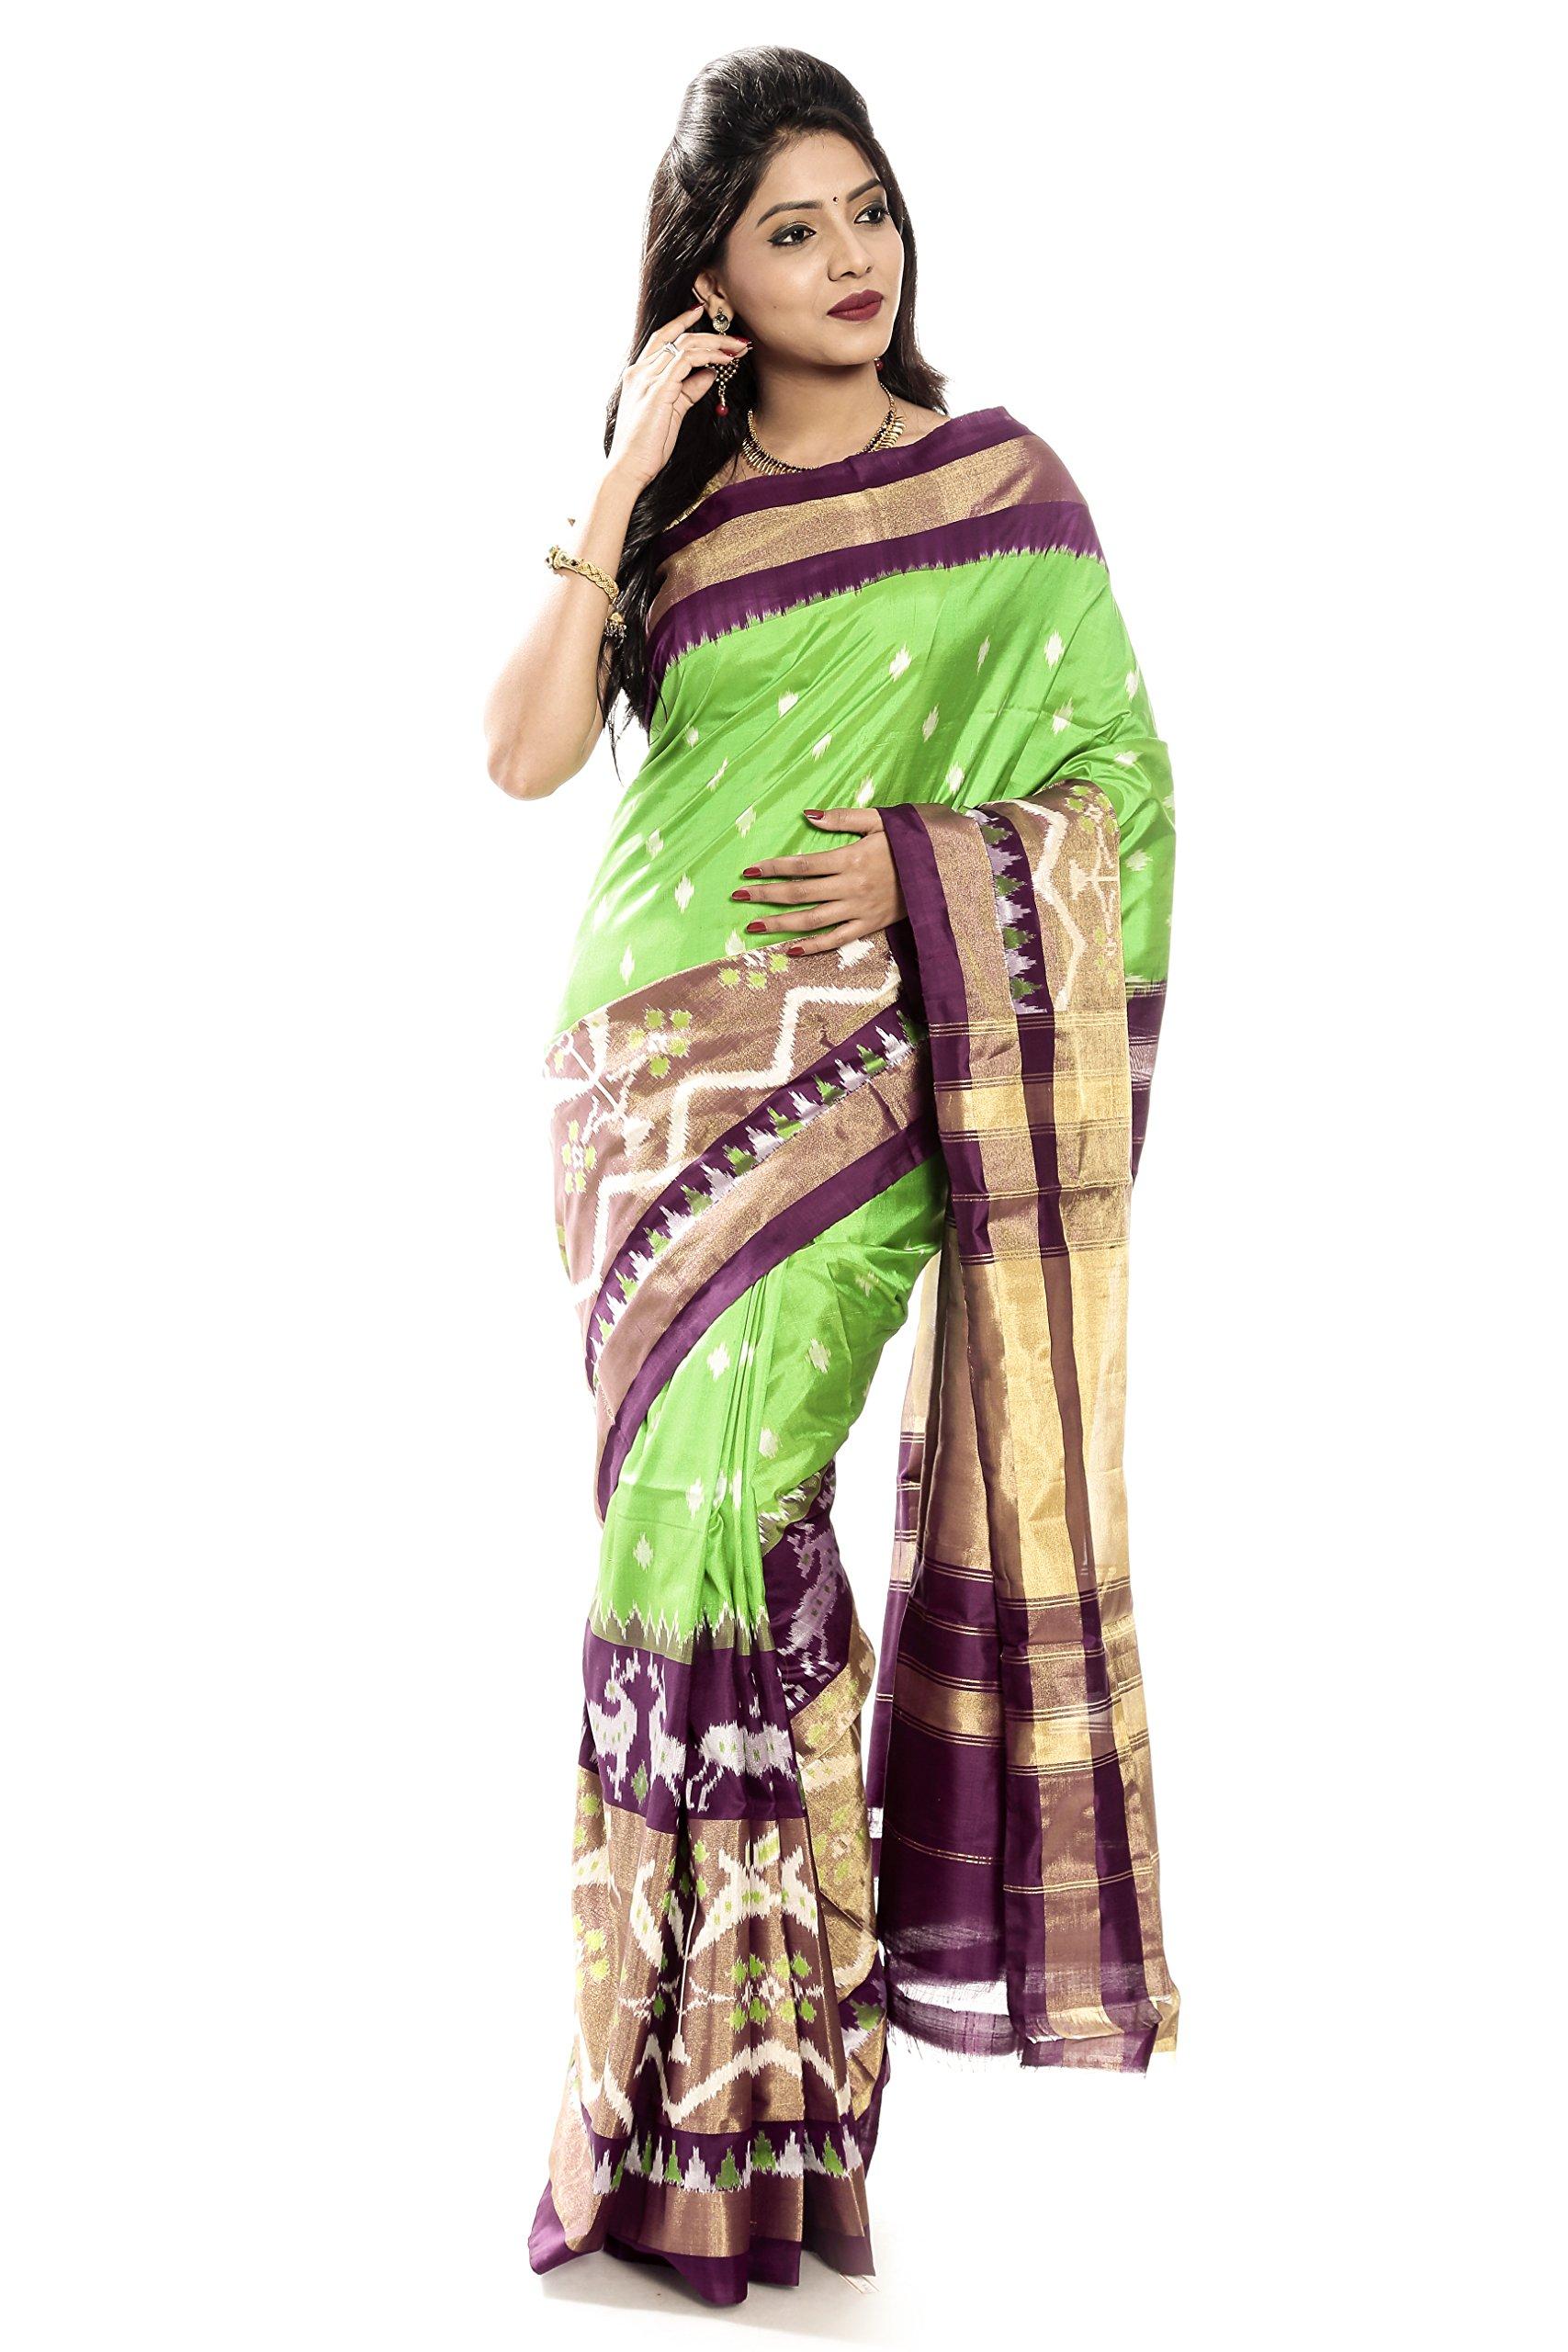 Mandakini — Indian Women's Pochampally - Handloom - Ikat Pure Silk Saree (Light Green- Maroon ) (MK337)